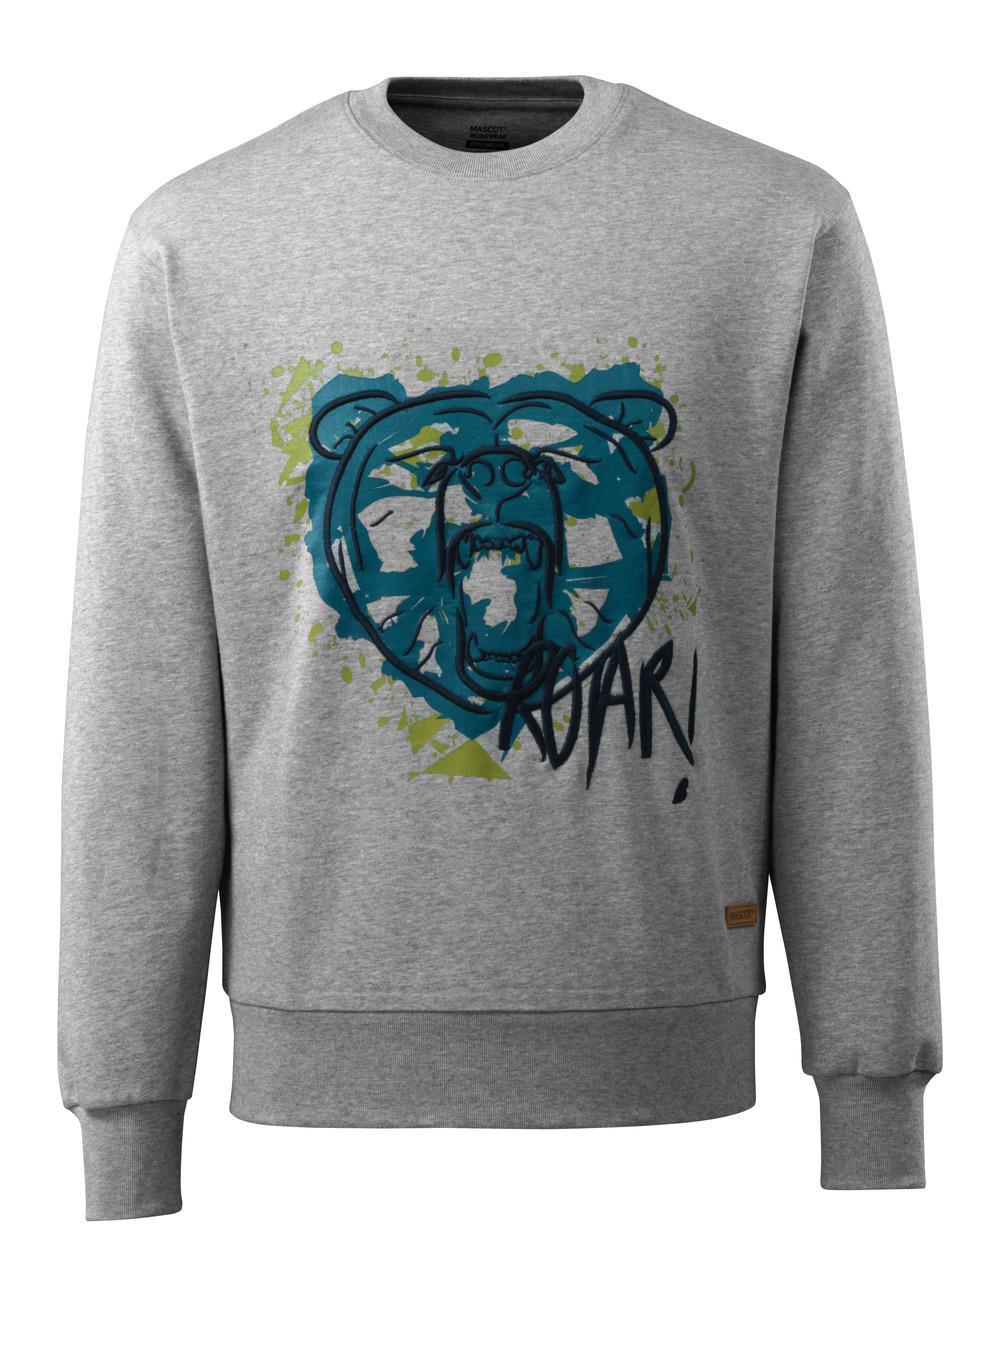 17284-280-08 Sweatshirt - grey